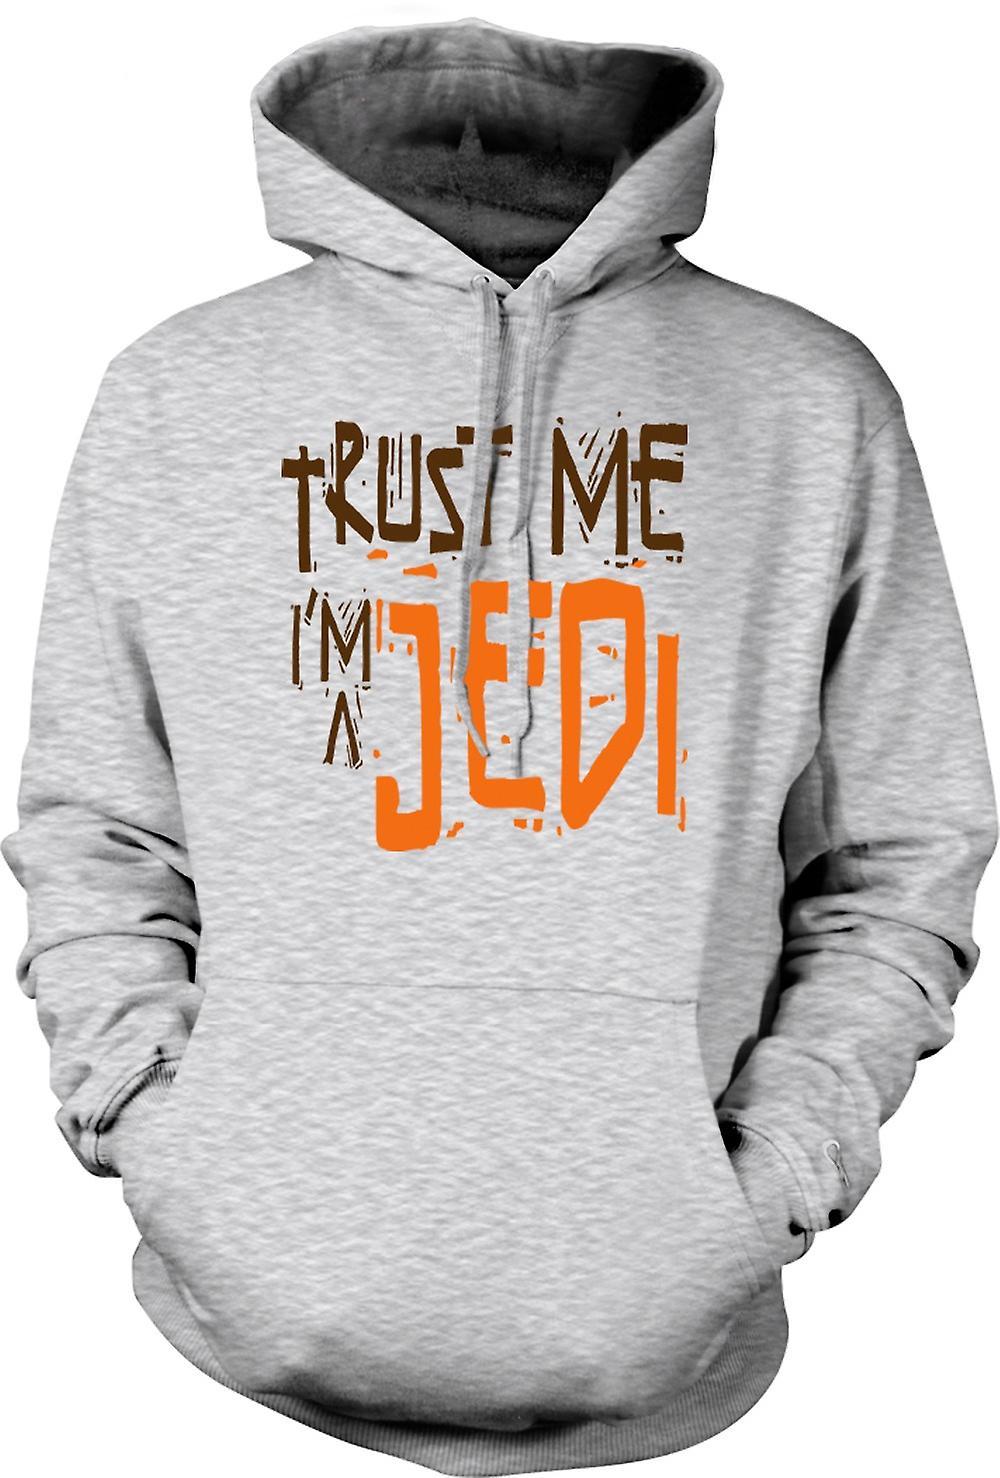 Mens-Hoodie - Vertrau mir ich bin ein Jedi - lustig